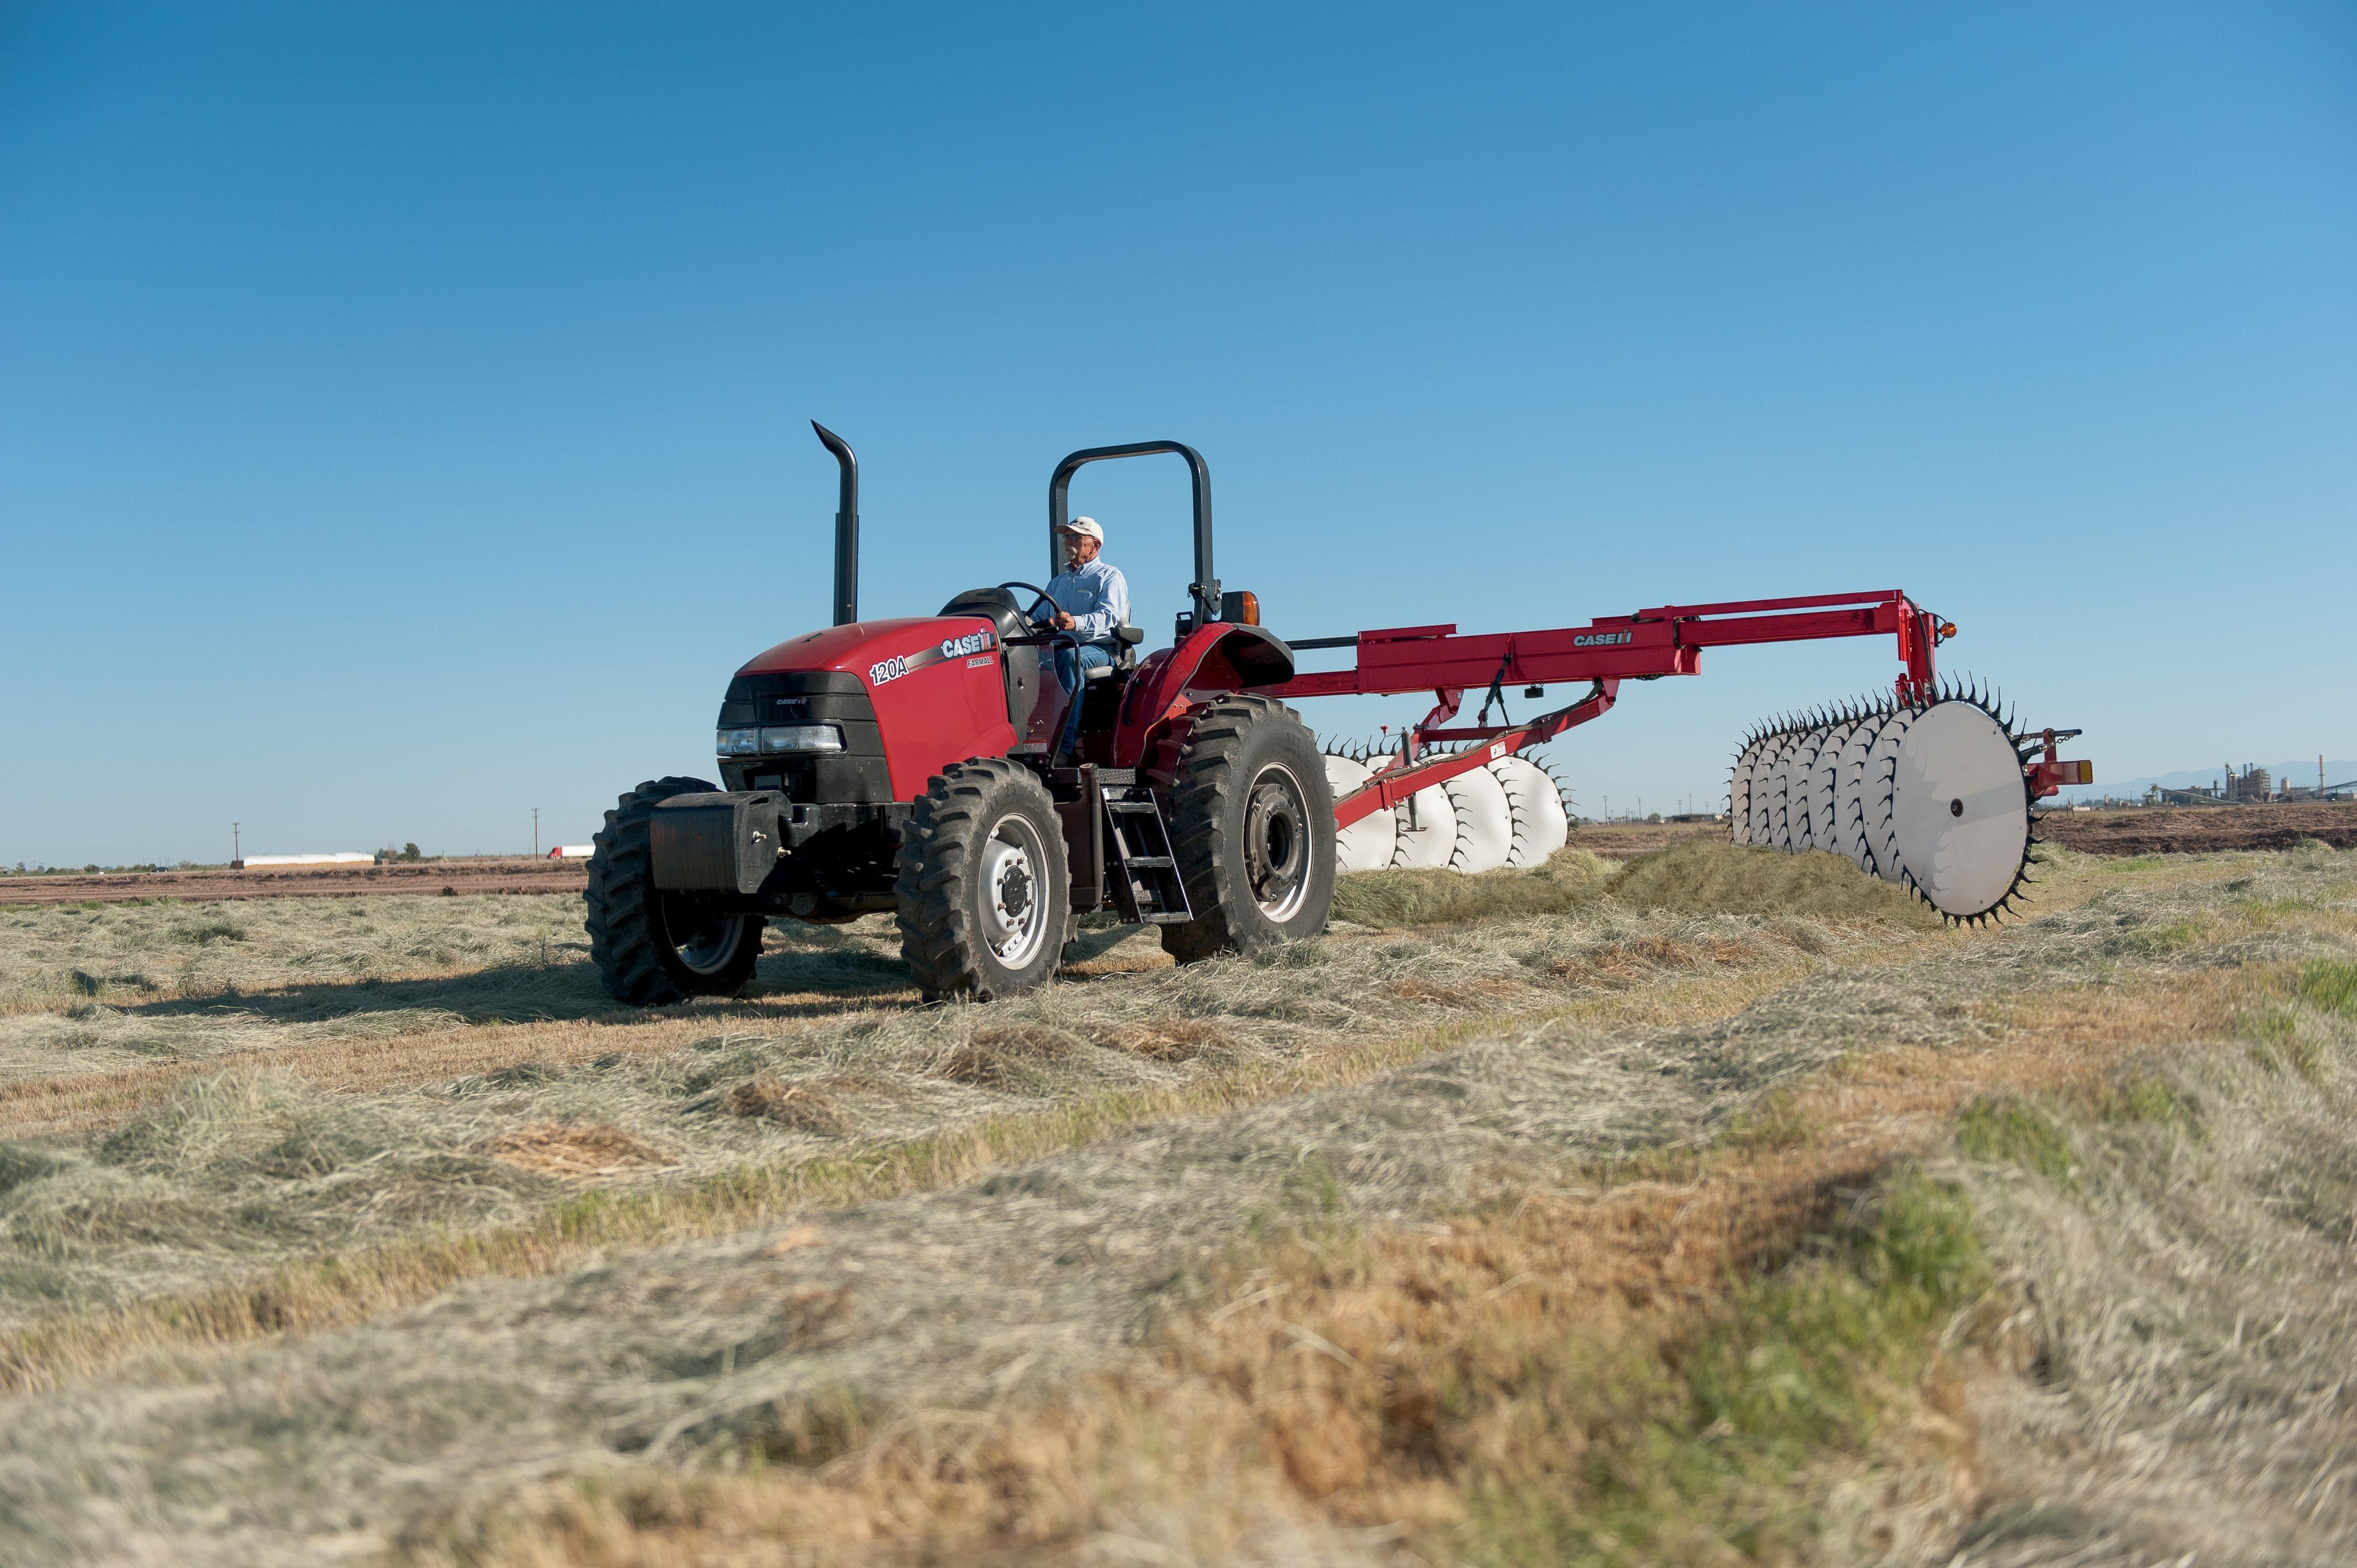 Farmall Series Compact Utility Tractors